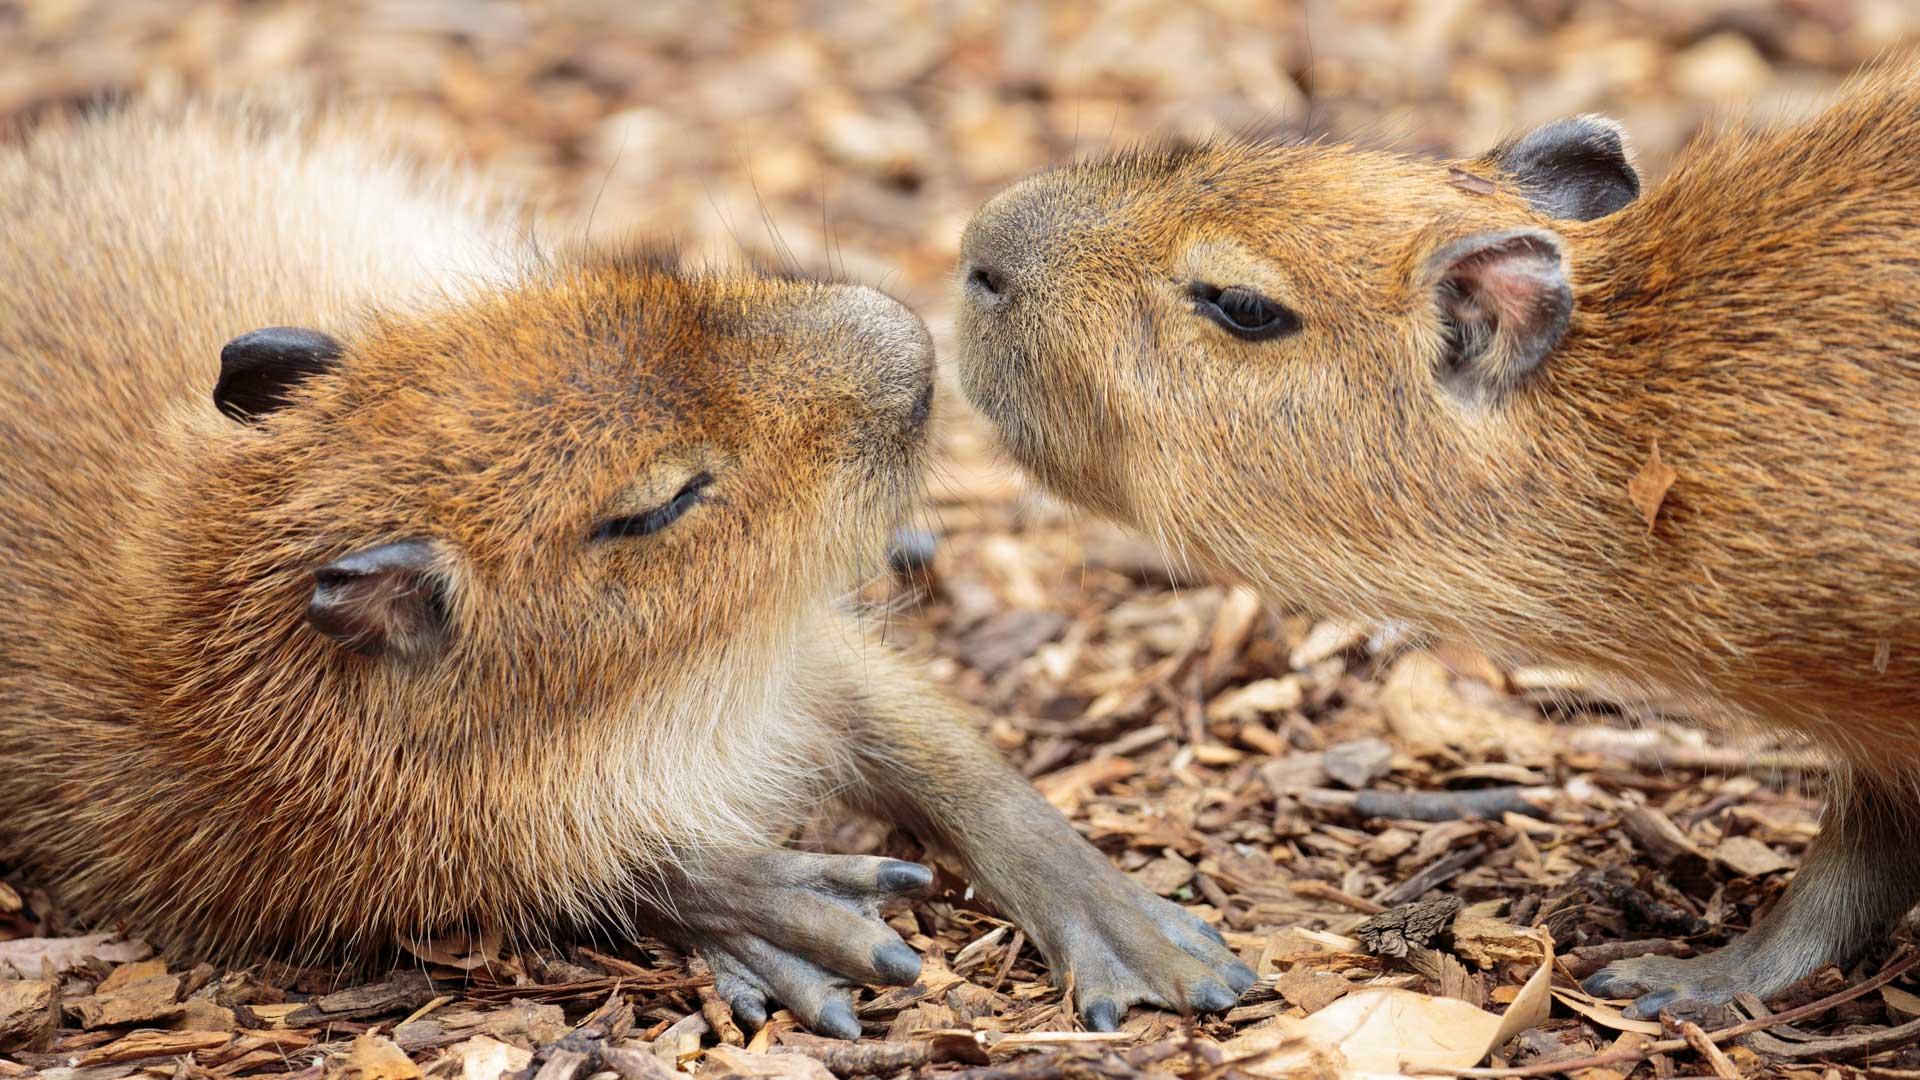 https://rfacdn.nz/zoo/assets/media/capybara-gallery-4.jpg